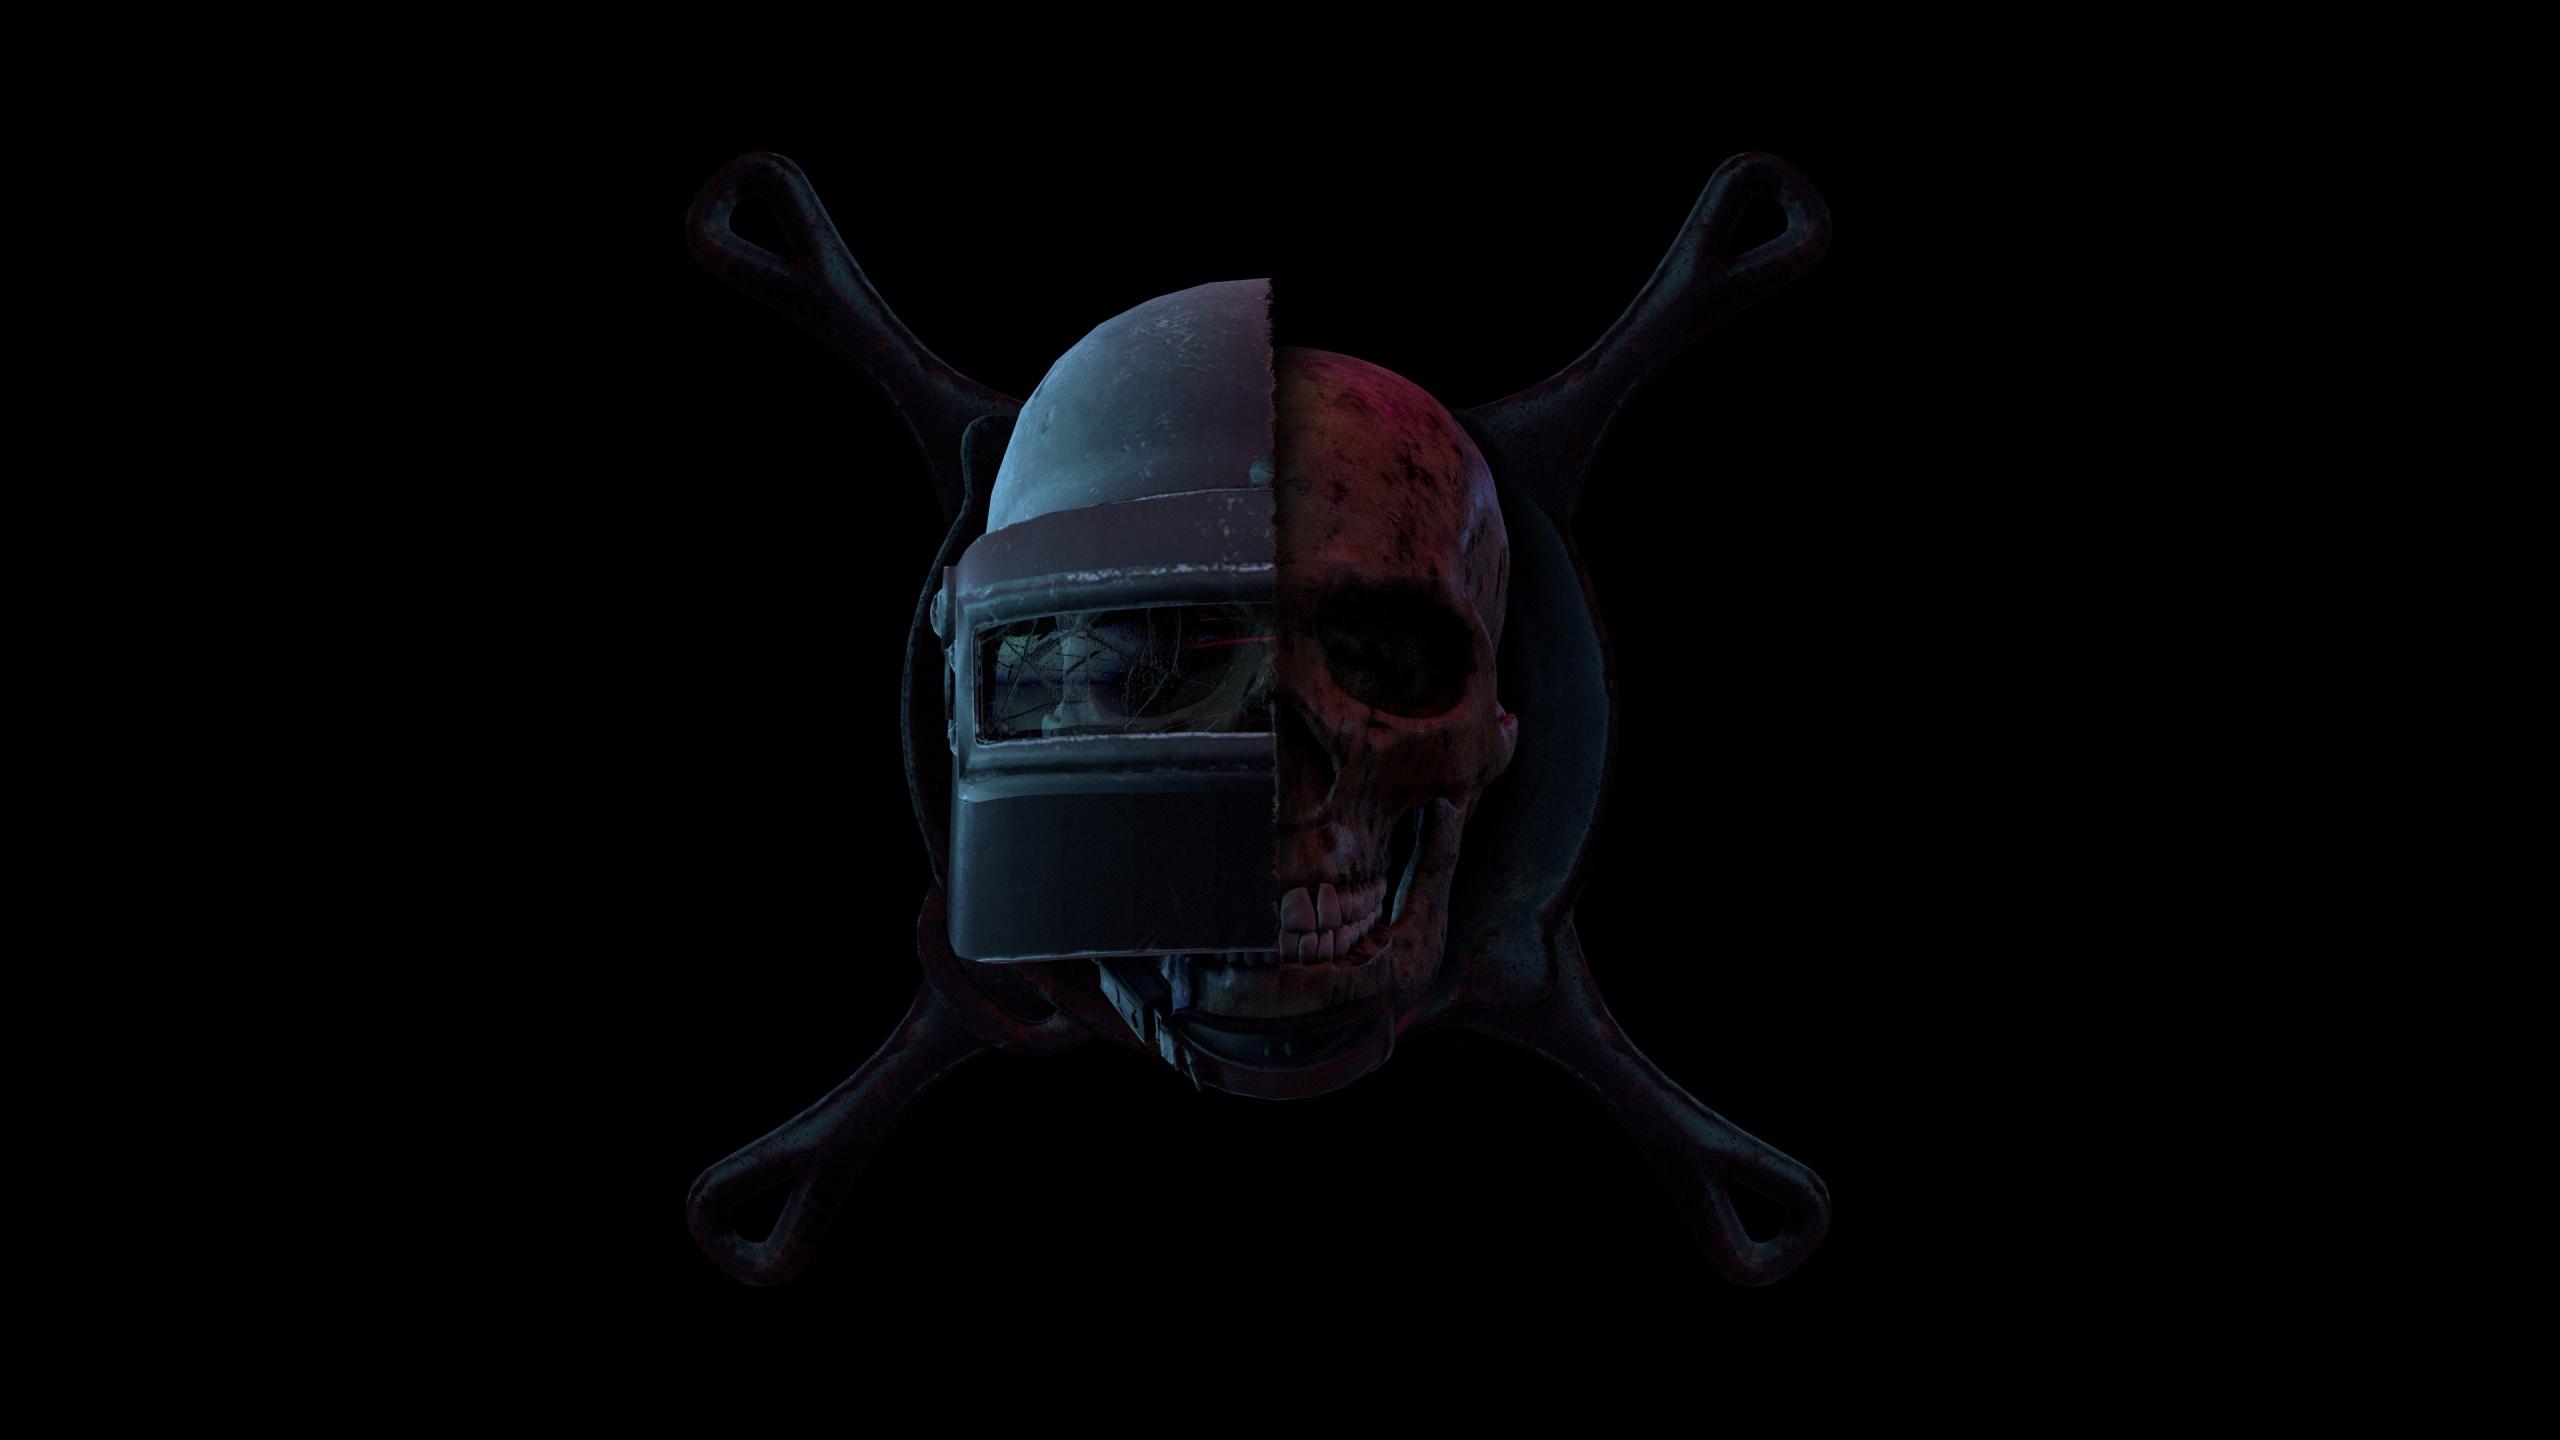 Pubg 4k Wallpaper Helmet Skull Black Background Black Dark 657